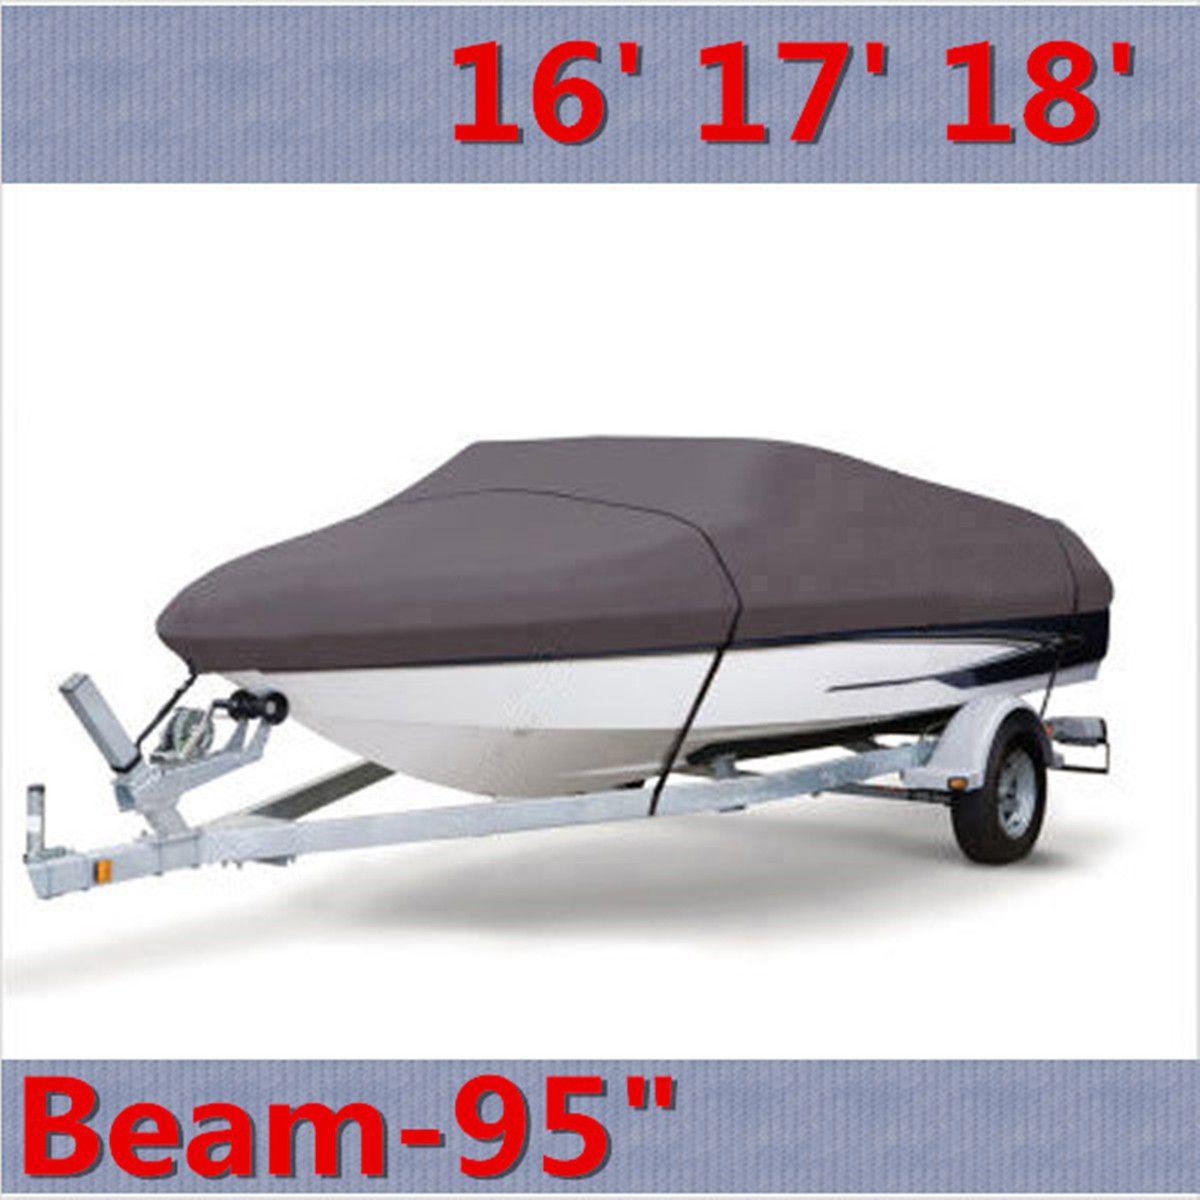 17 18 19 inch Boat Cover Beam-95 Heavy Duty Trailerable 210D V-Hull 550cm x 320cm